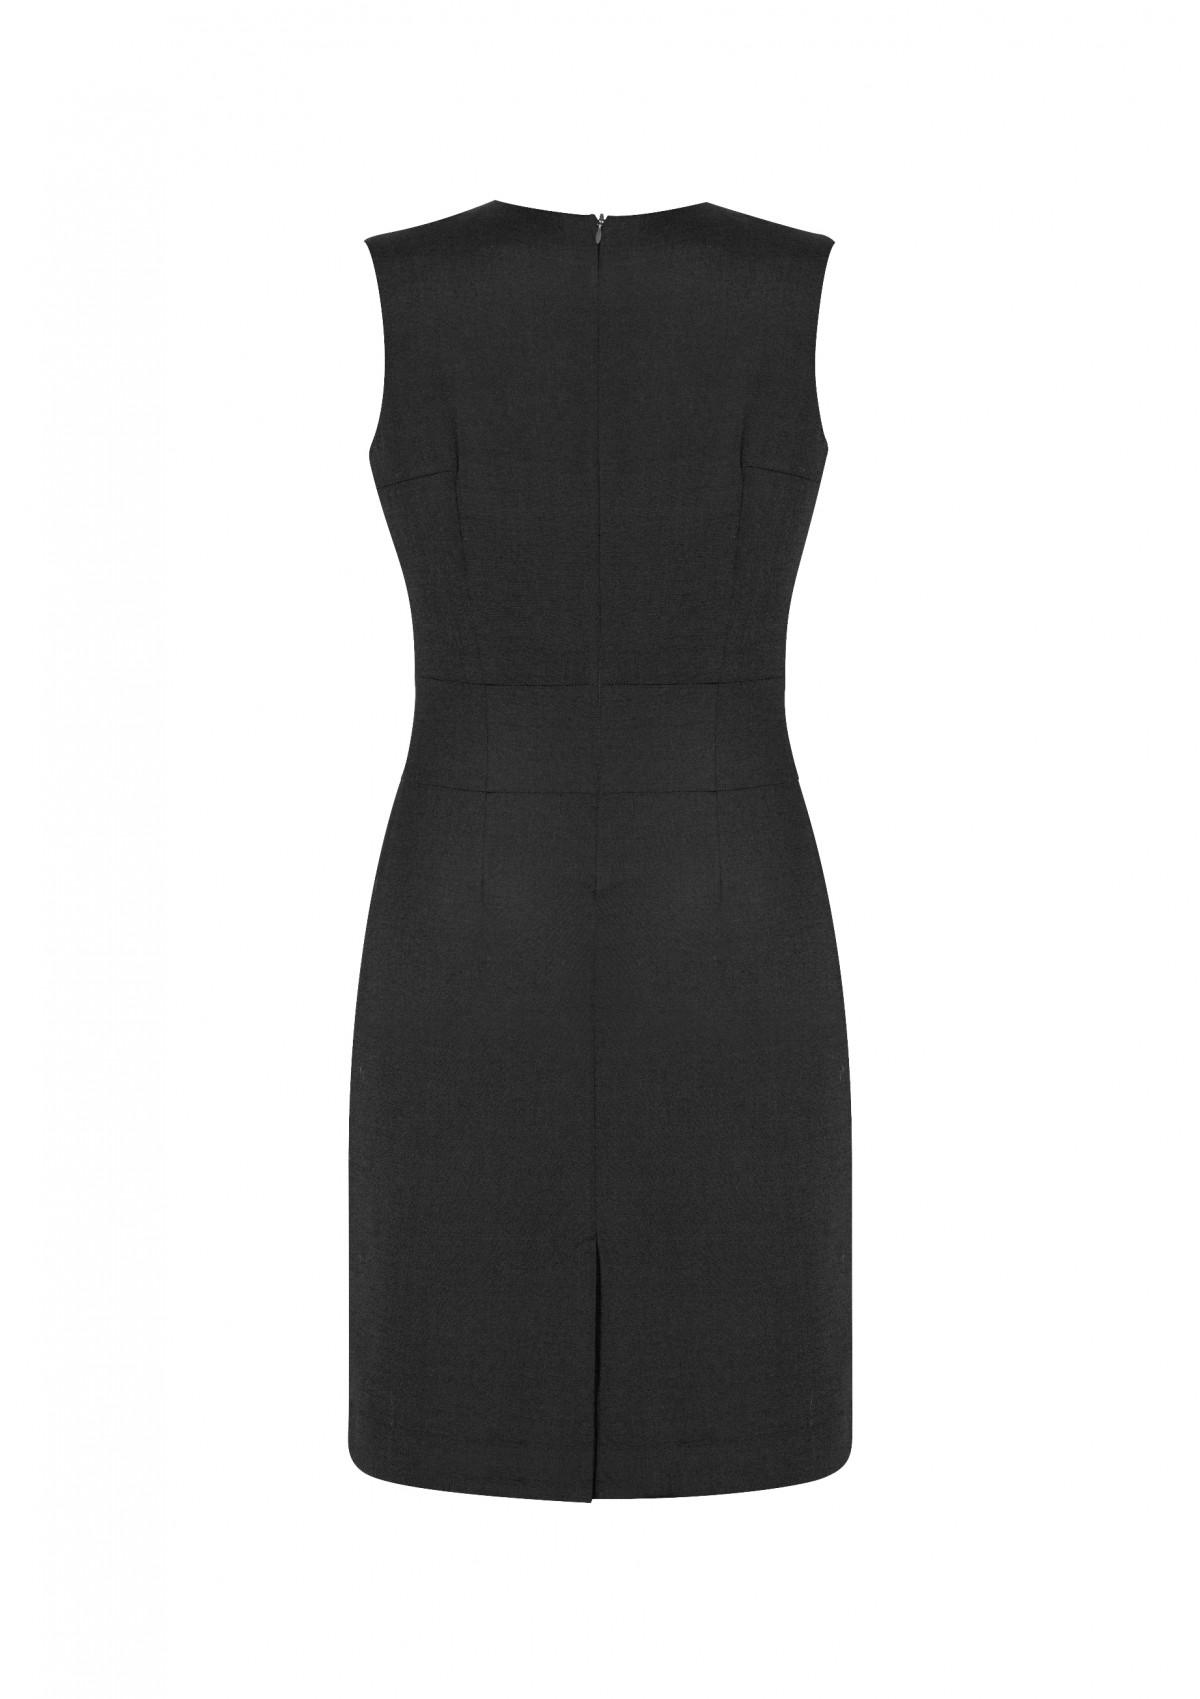 3030b56a42371 Ladies Sleeveless V Neck Cool Stretch Dress - The Uniform Centre